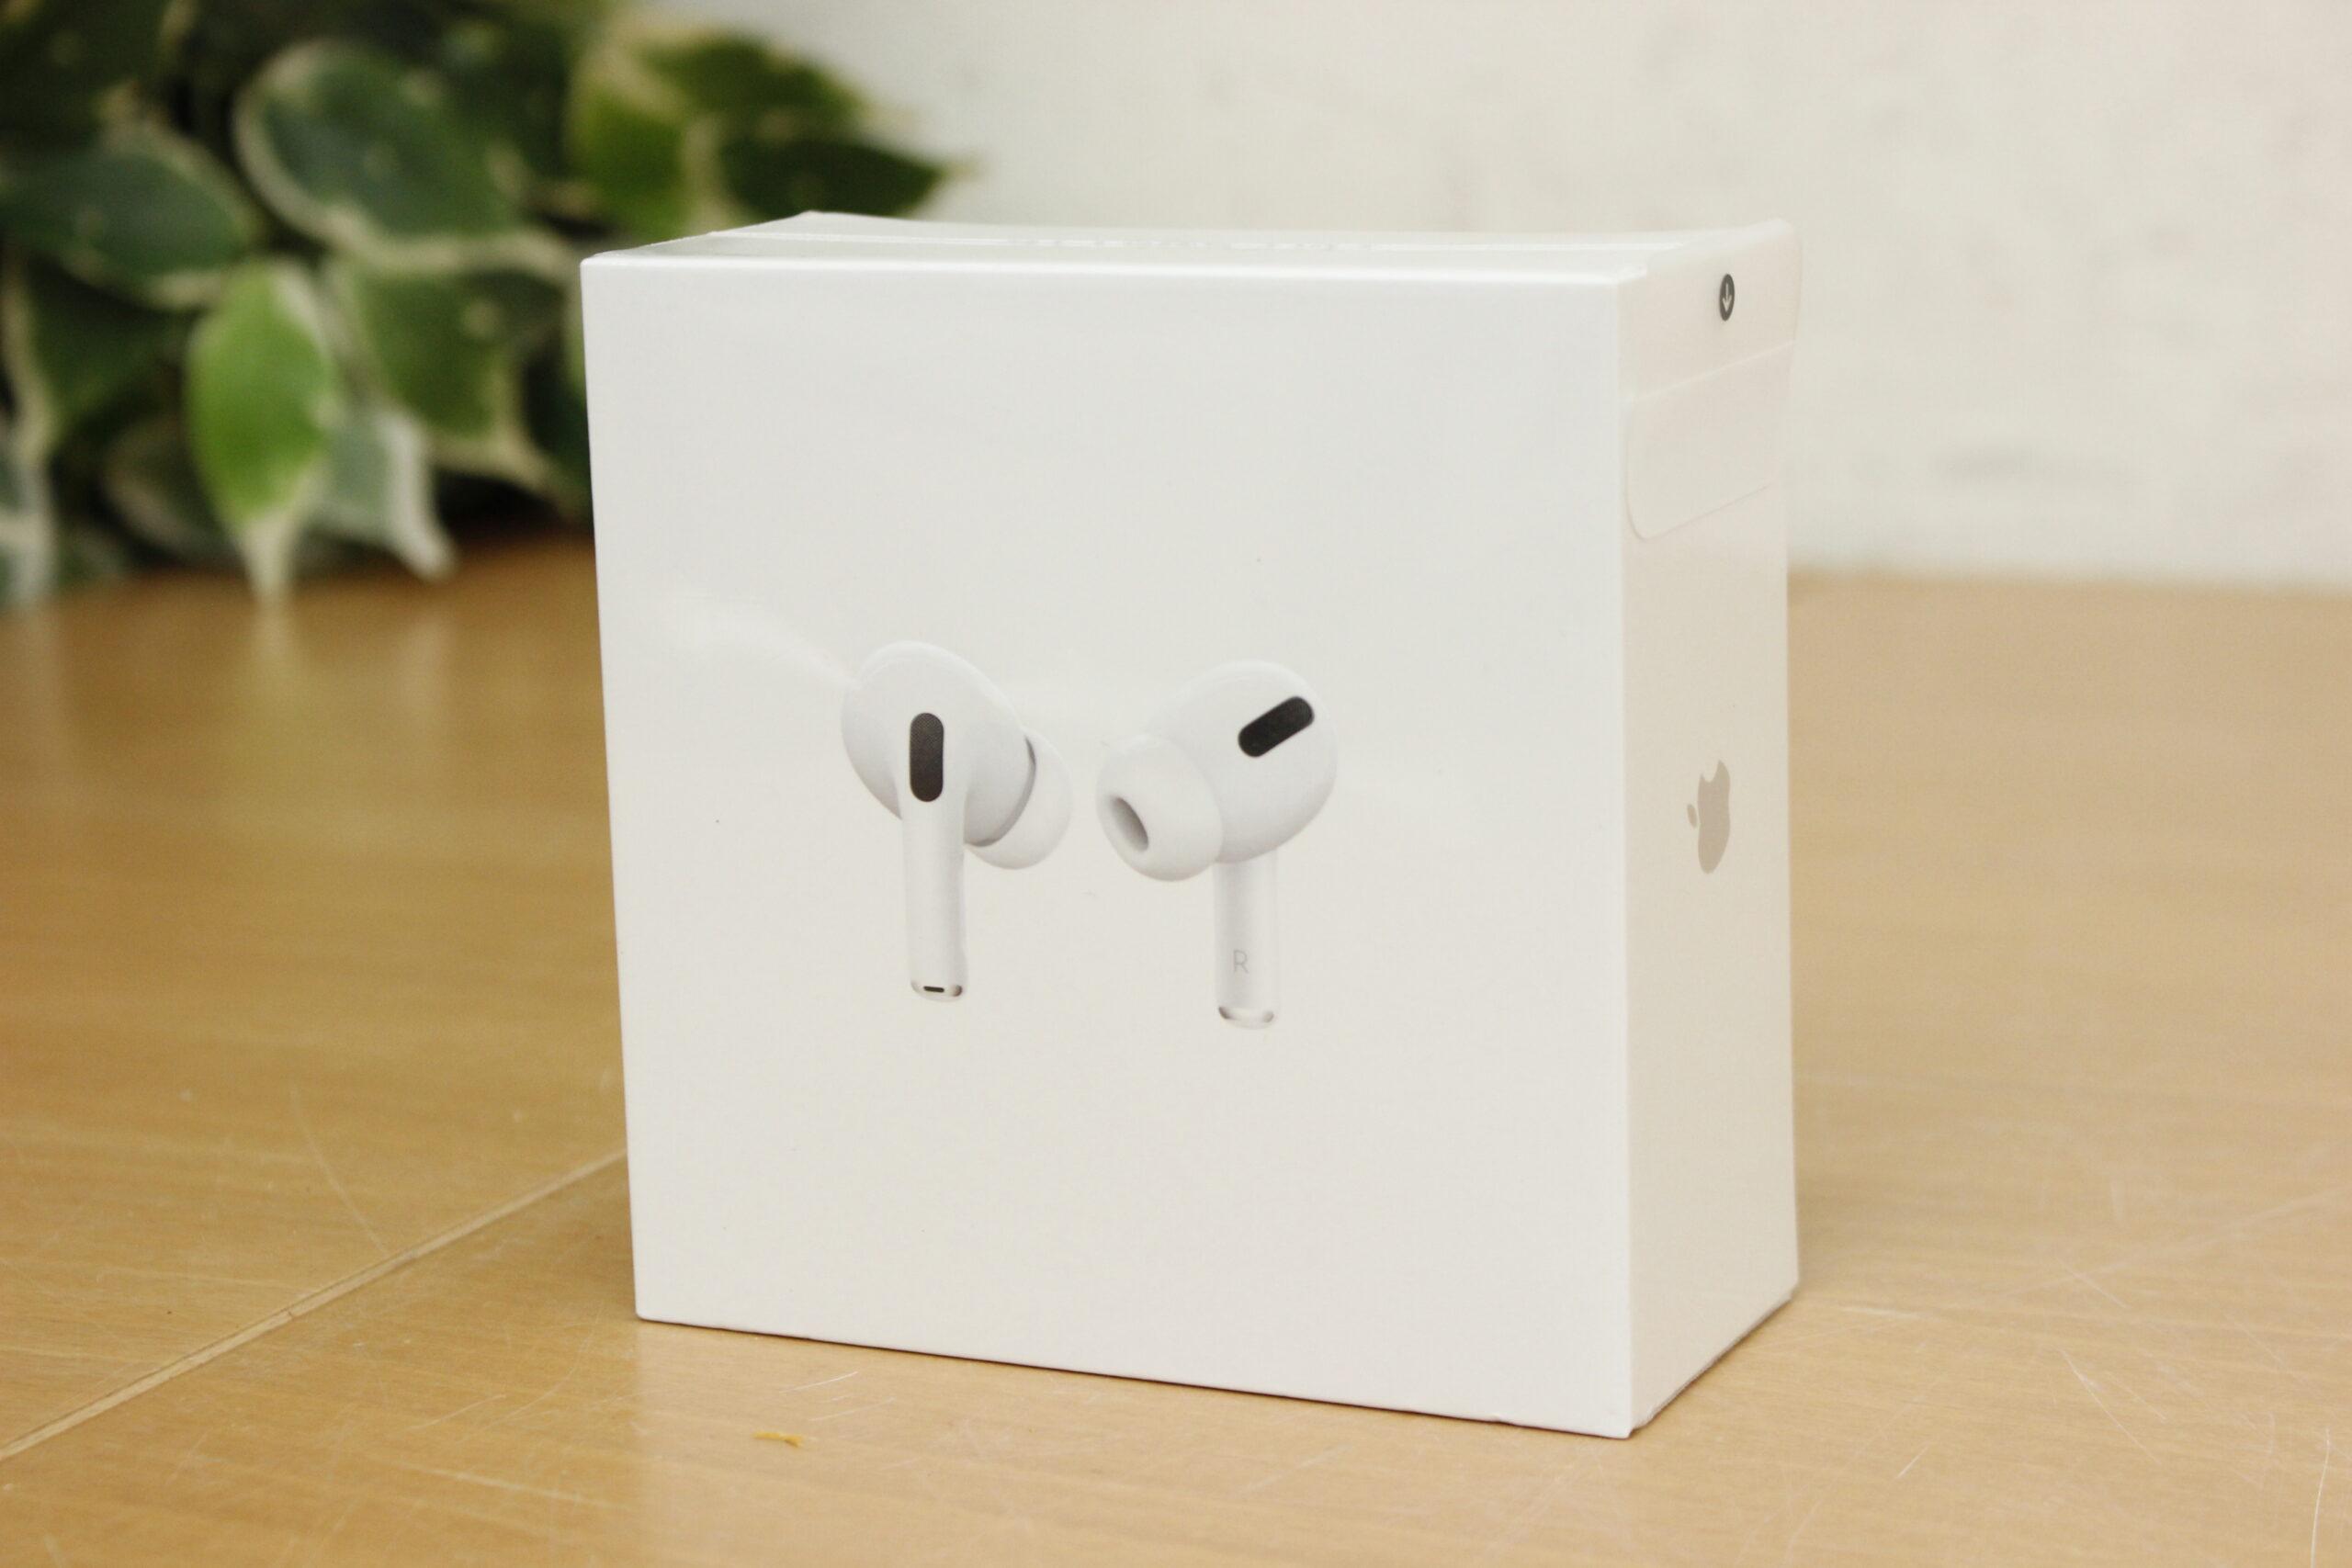 Apple AirPods Pro MWP22J/A ☆ iPad iMac iPhone MacBook など アップル製品は特に高価買取!!の買取-